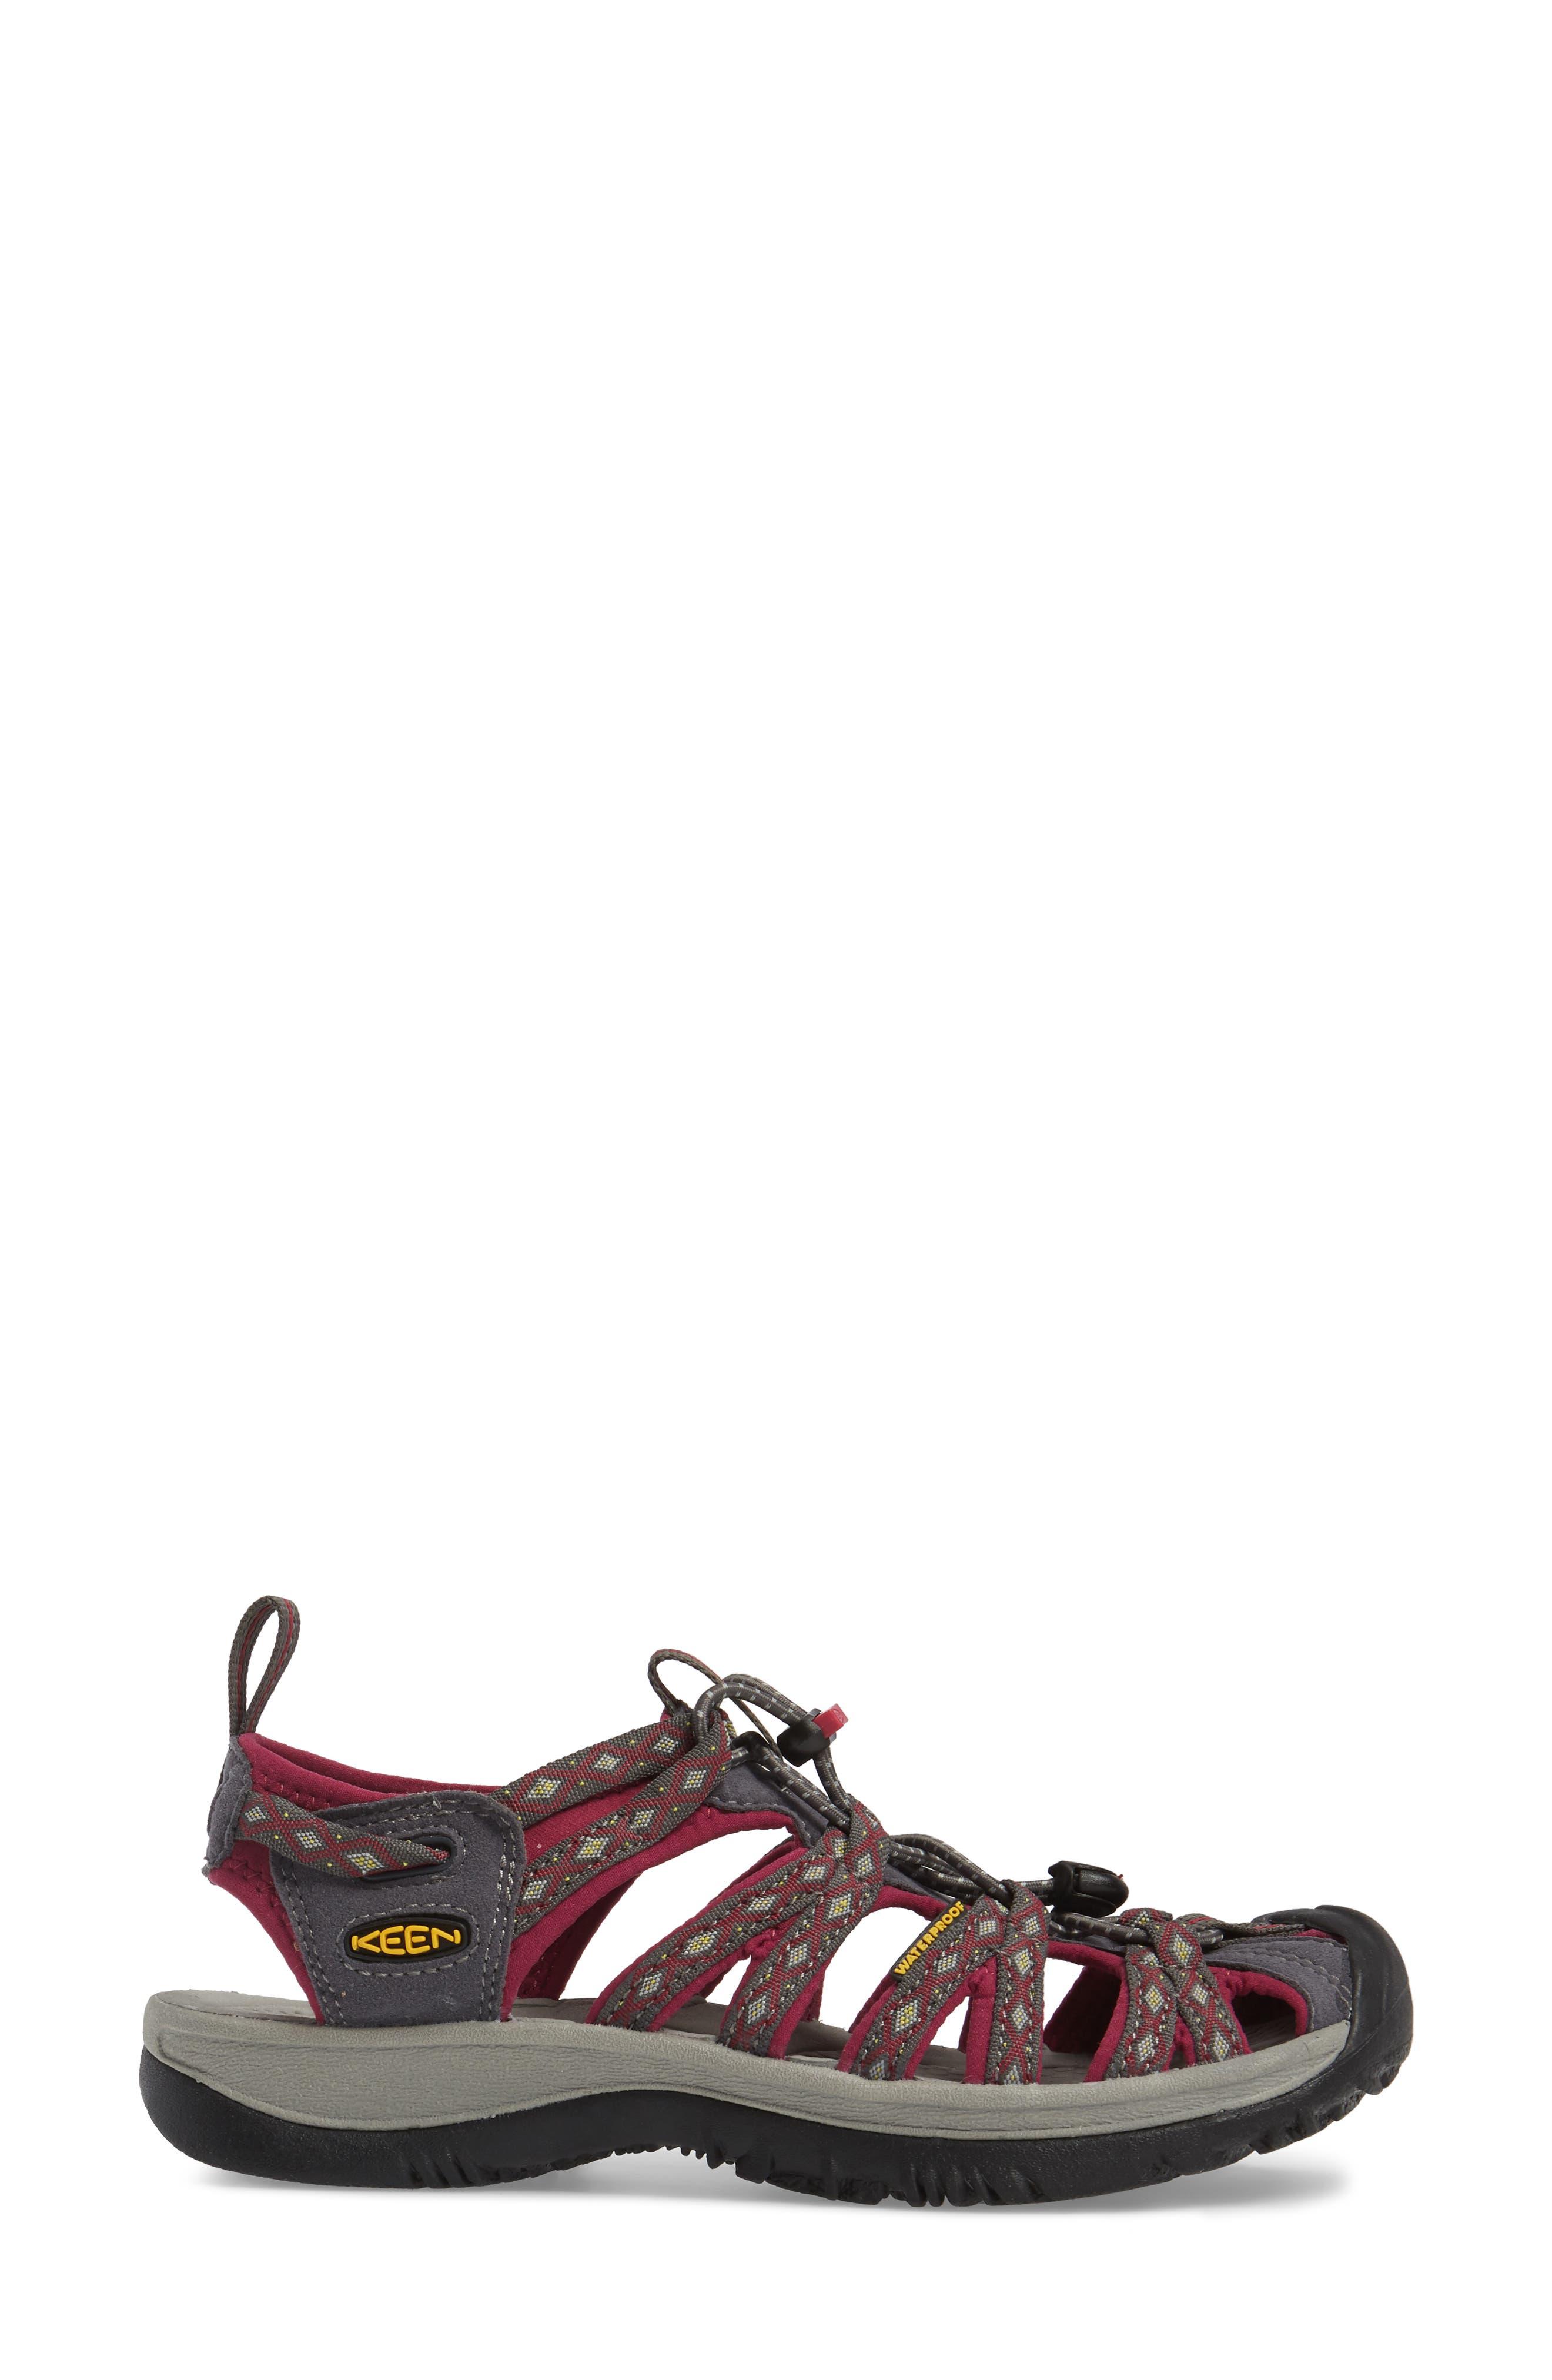 Alternate Image 3  - Keen 'Whisper' Water Friendly Sport Sandal (Women)